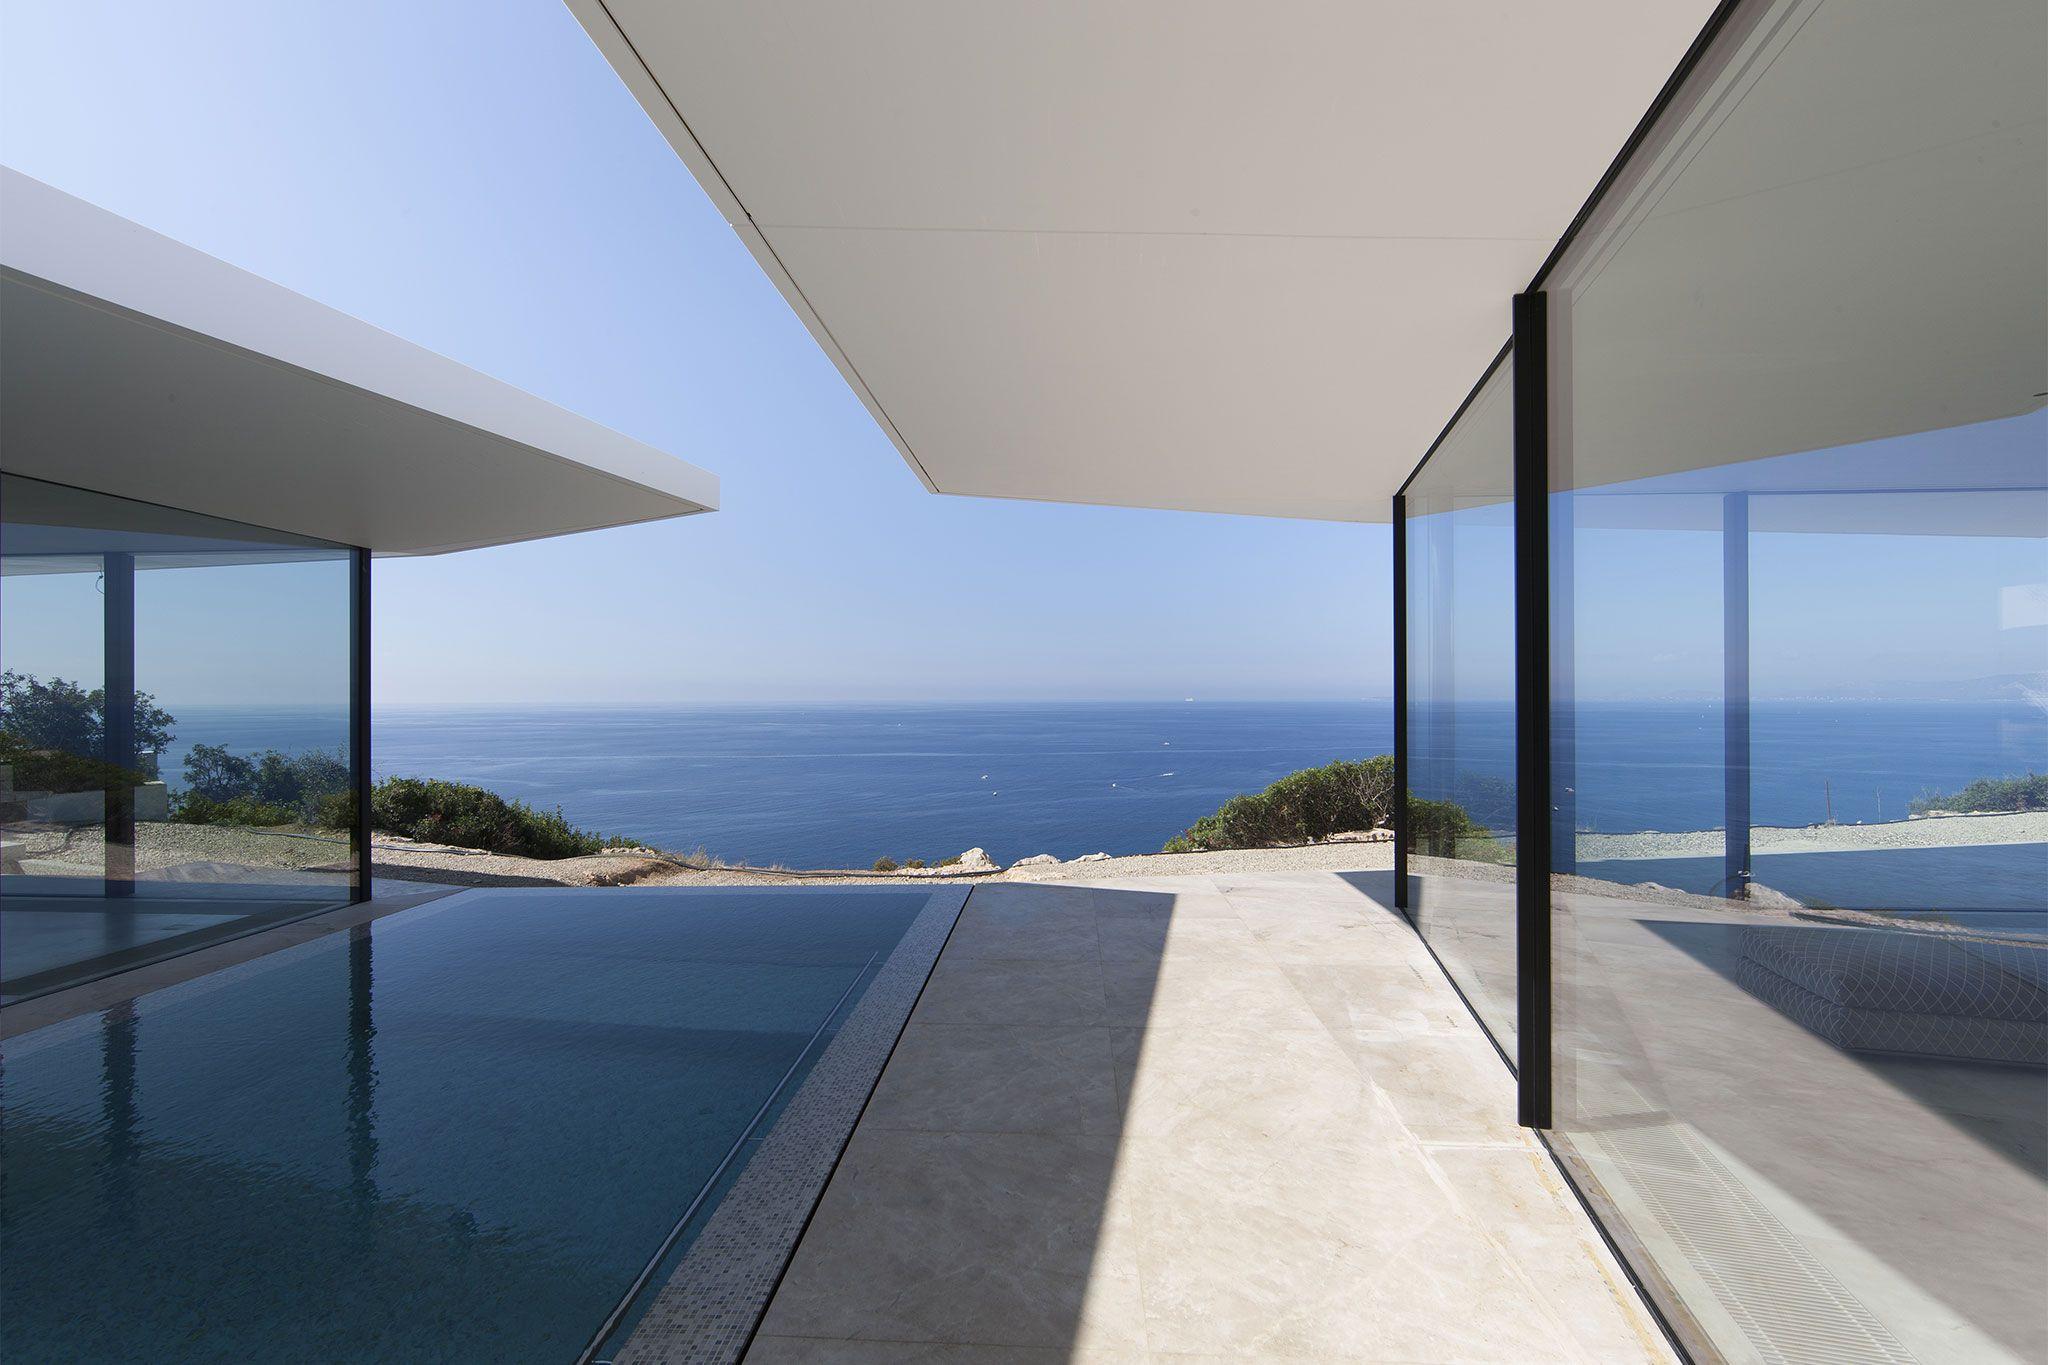 Casa unifamiliar Mallorca (Port d'Andratx) - Grabalosa arquitectura metàl·lica